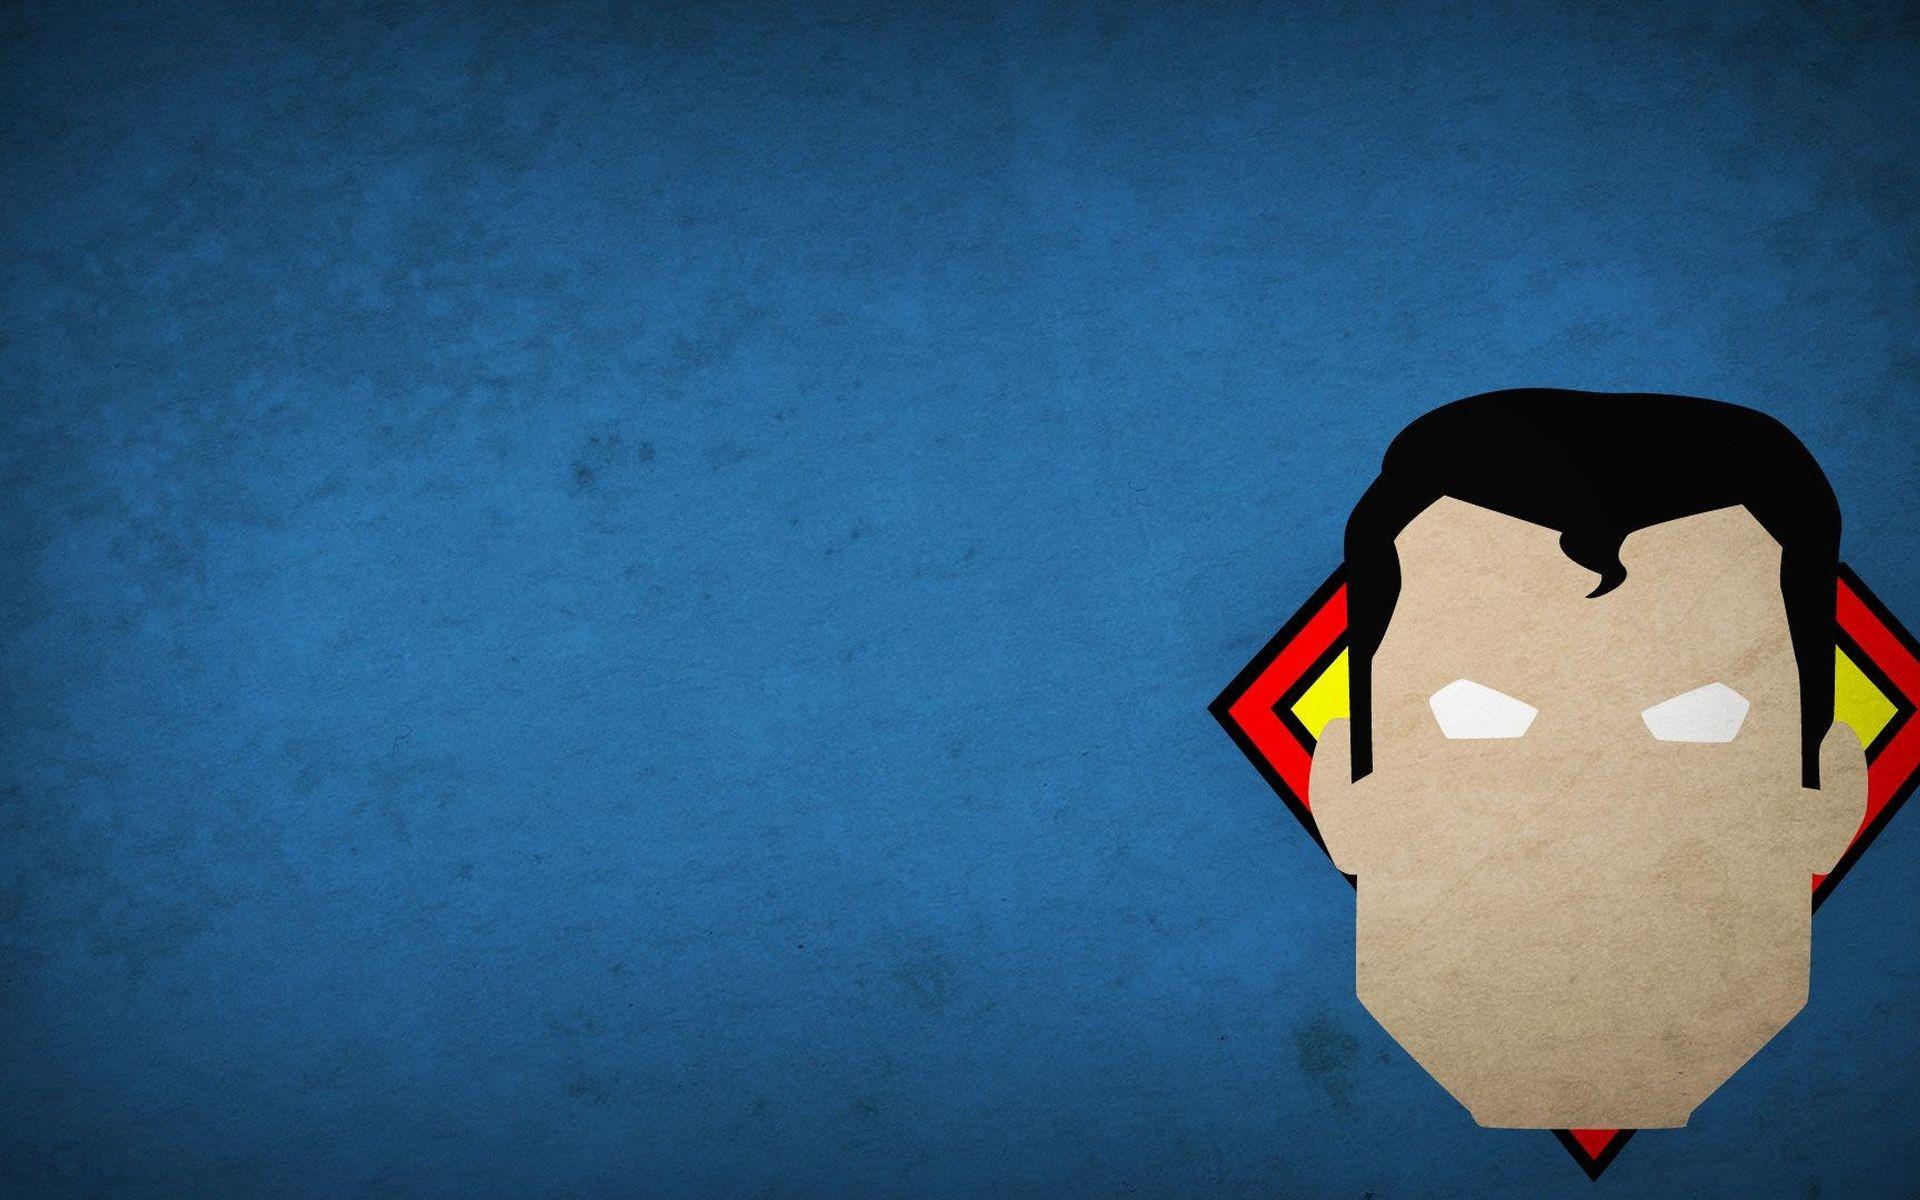 Minimalist Superhero 1080p Wallpaper